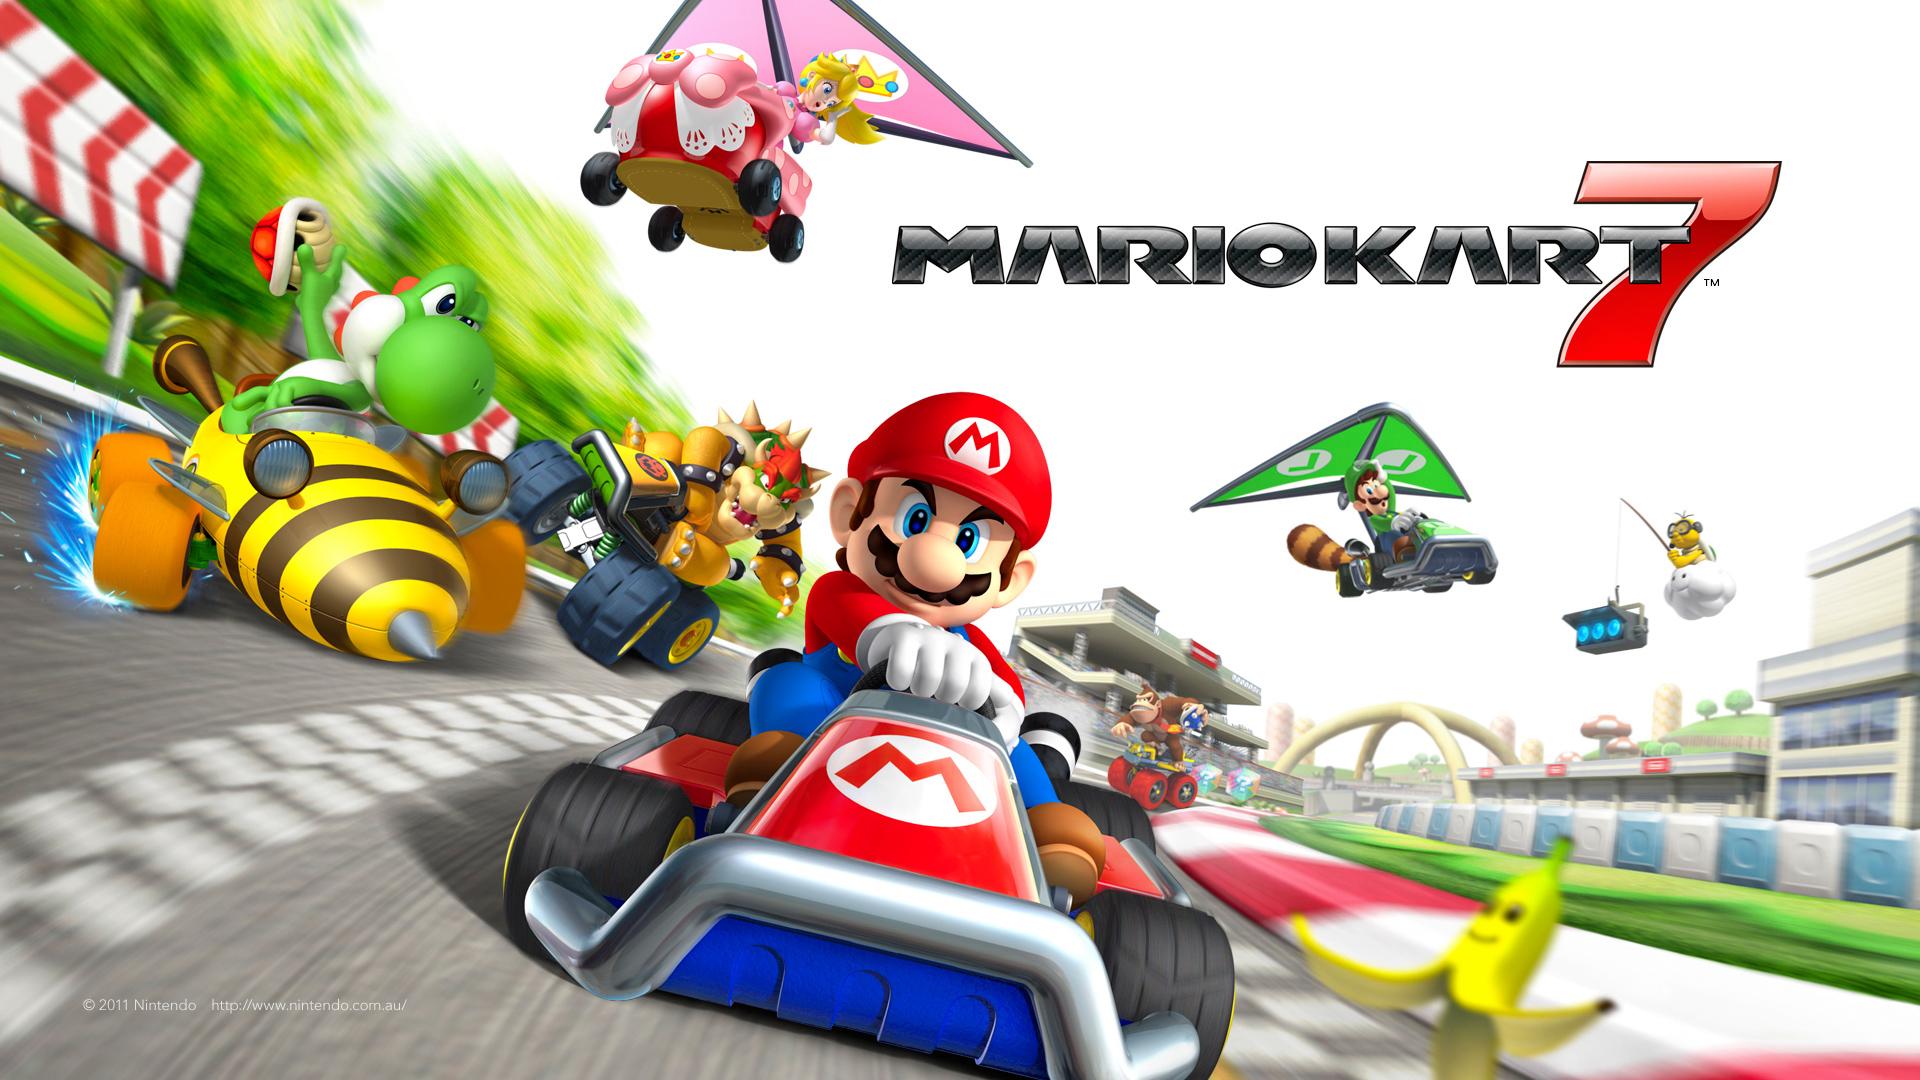 Mario Kart Double Dash Hd Wallpapers Backgrounds Wallpaper 1920x1080